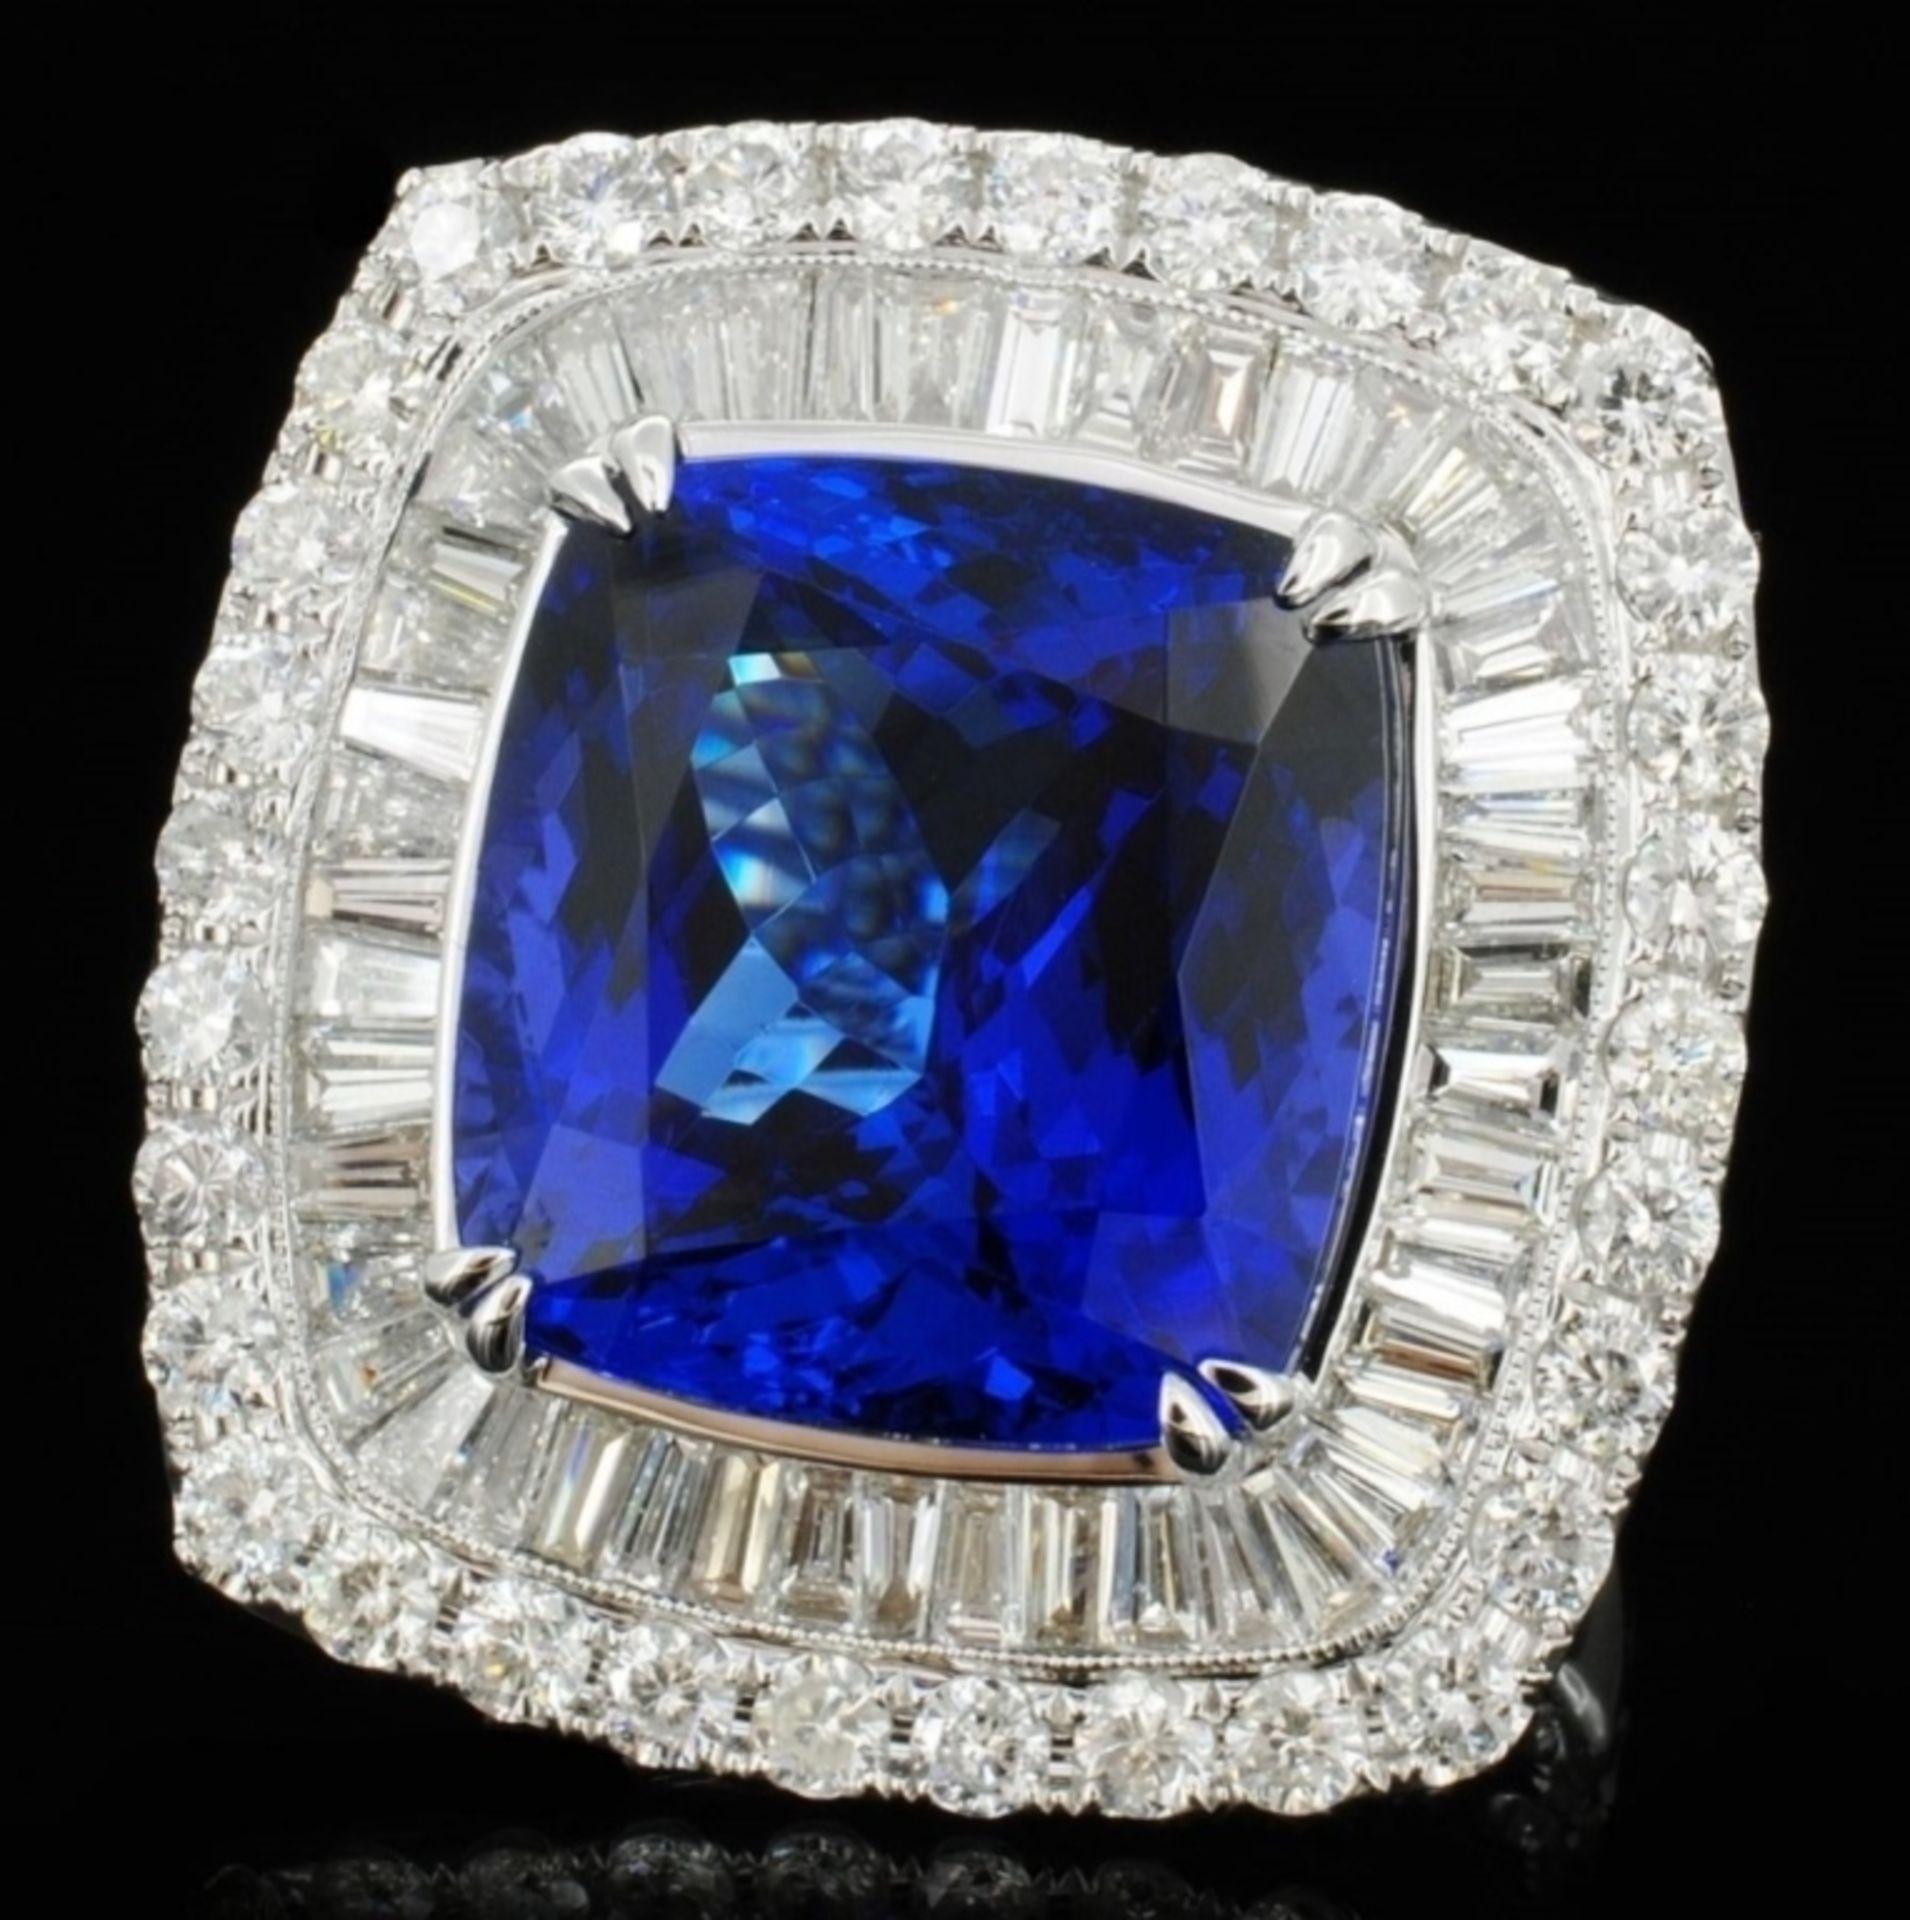 18K White Gold 17.88ct Tanzanite & 4.24ct Diamond - Image 2 of 5